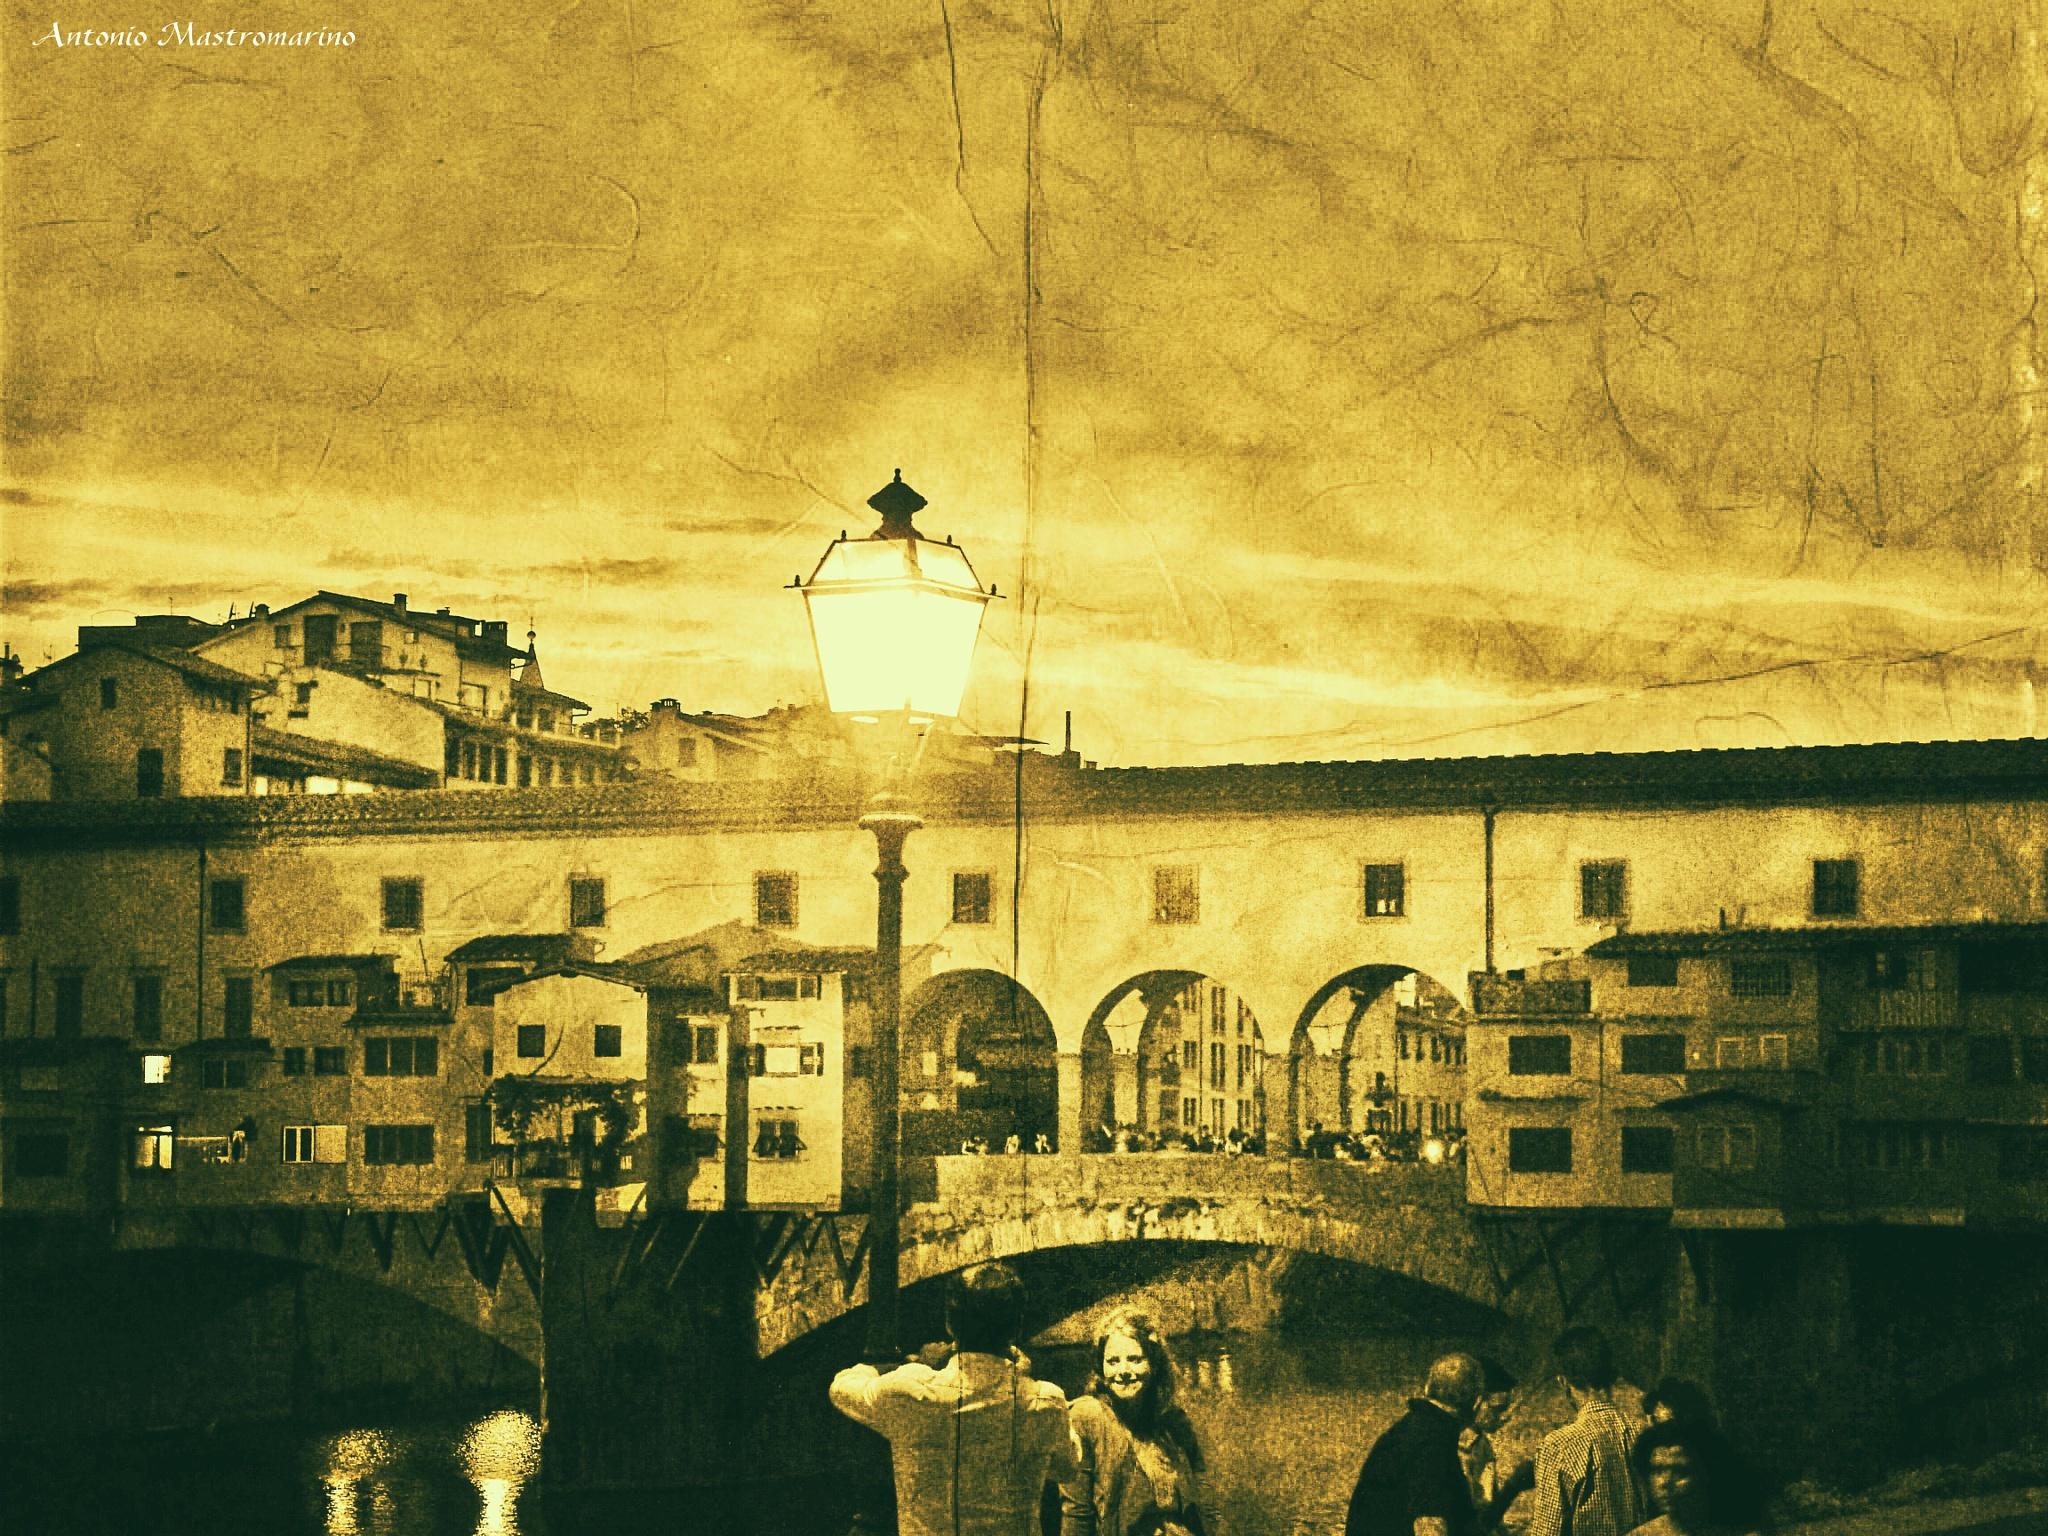 Firenze Ponte Vecchio by antonio mastromarino